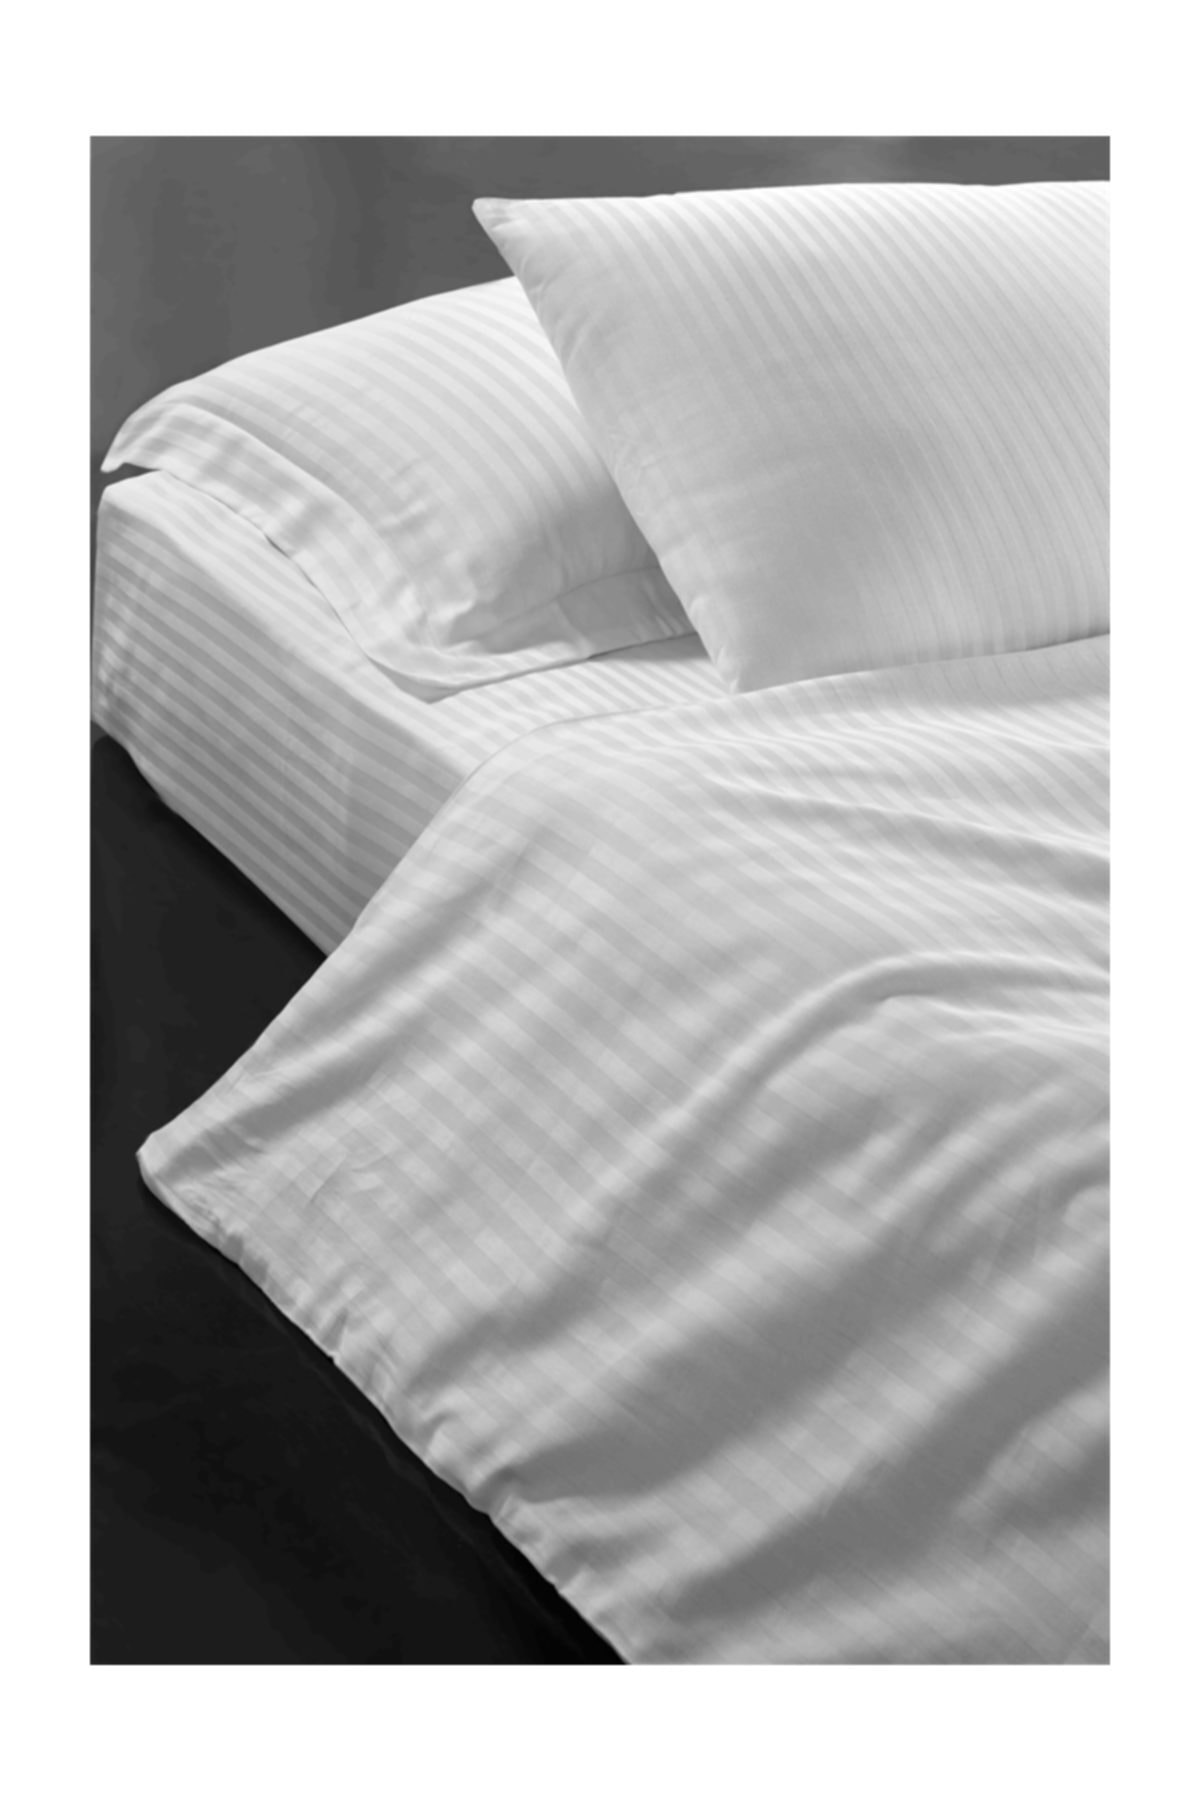 VAROL Zeus Serisi Otel Nevresimi (Yorgan Kılıfı) 200x220 83 Tel 1